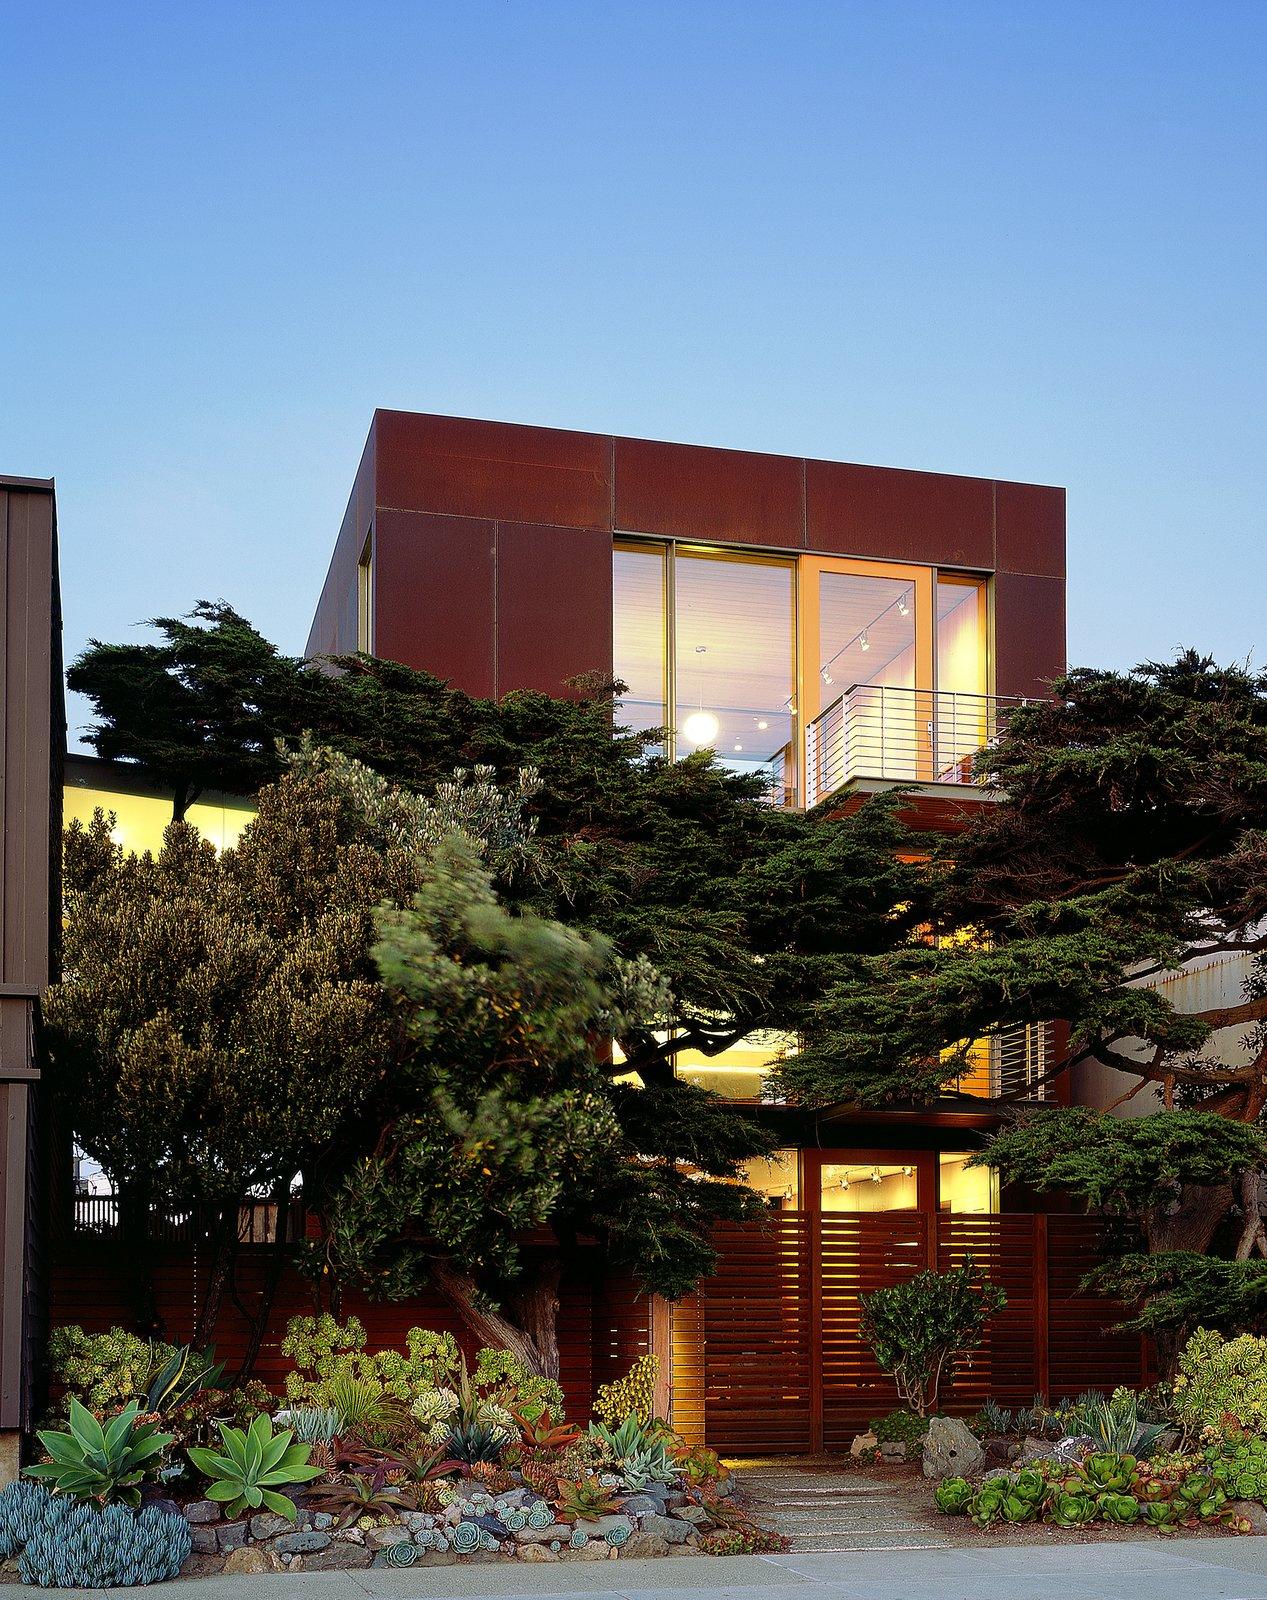 Ocean Beach Residence by Aidlin Darling Design